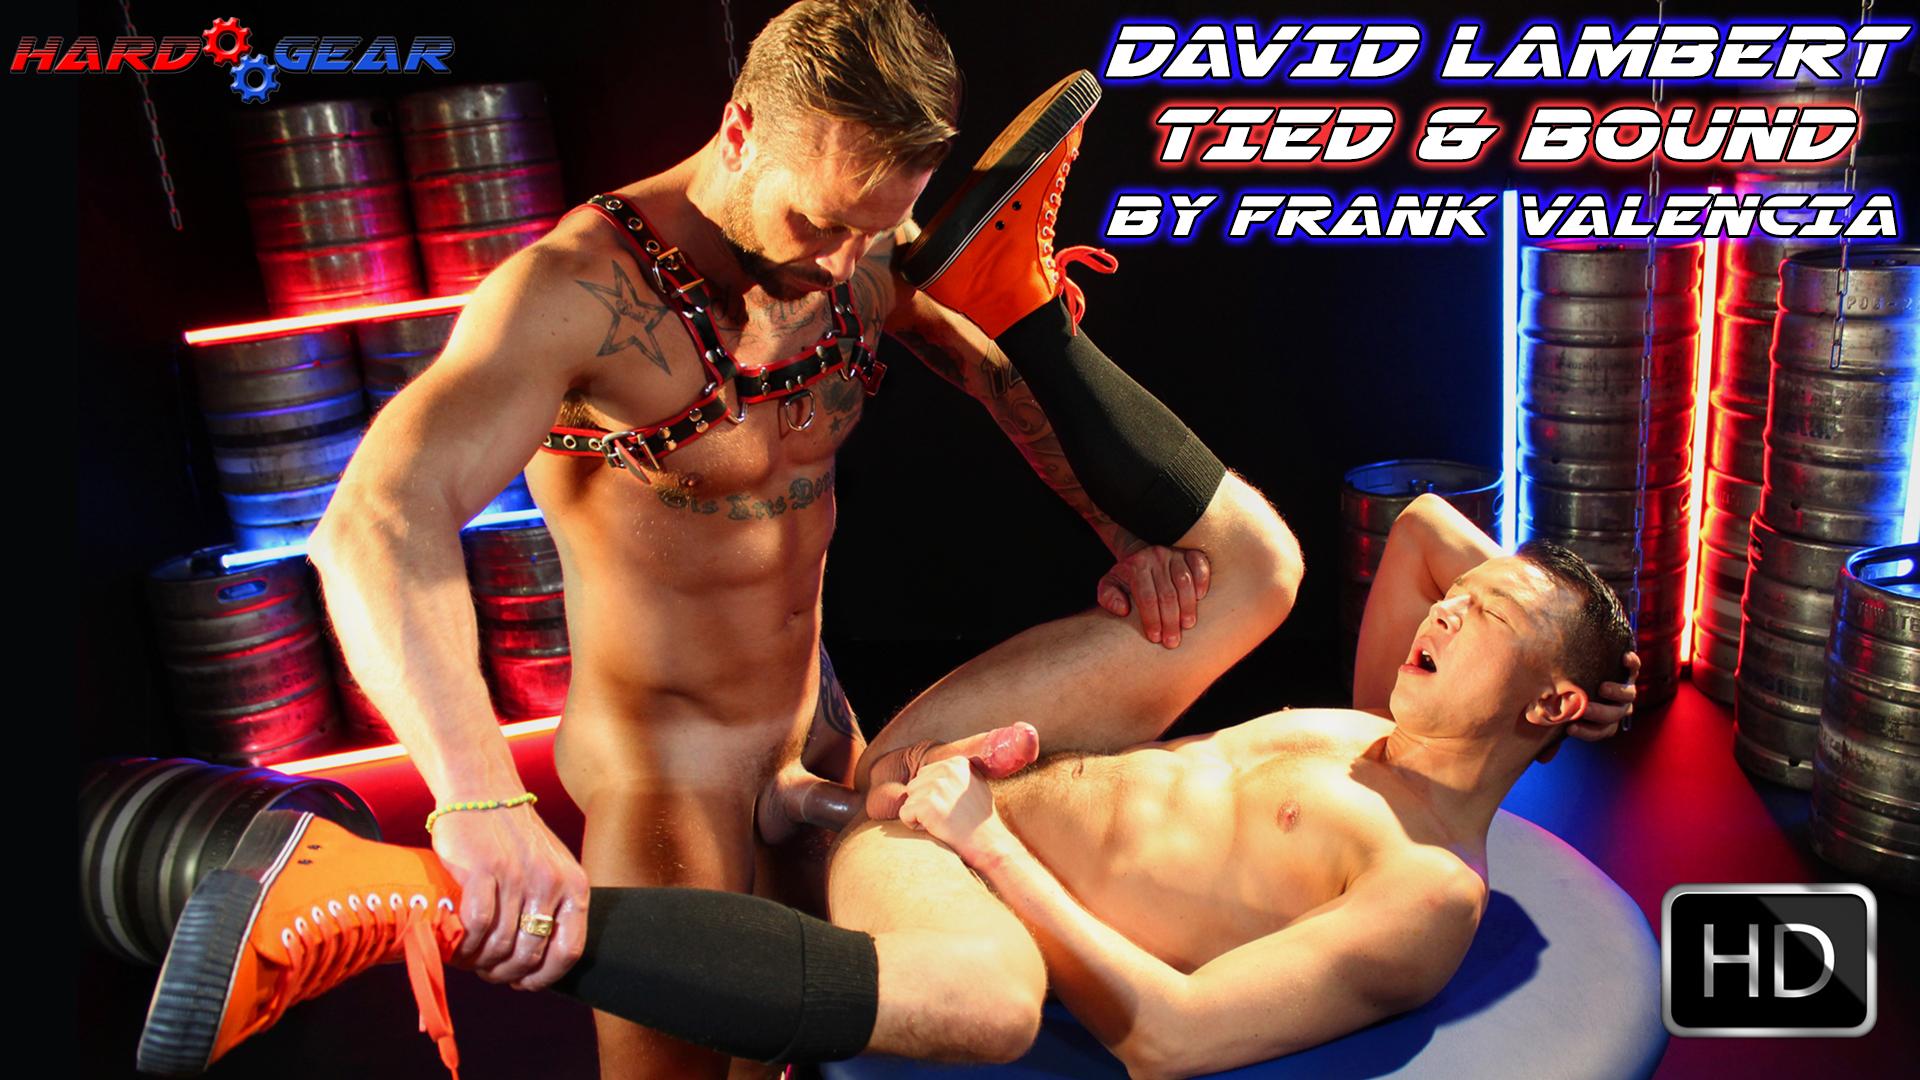 David Lambert Tied & Bound By Frank Valencia